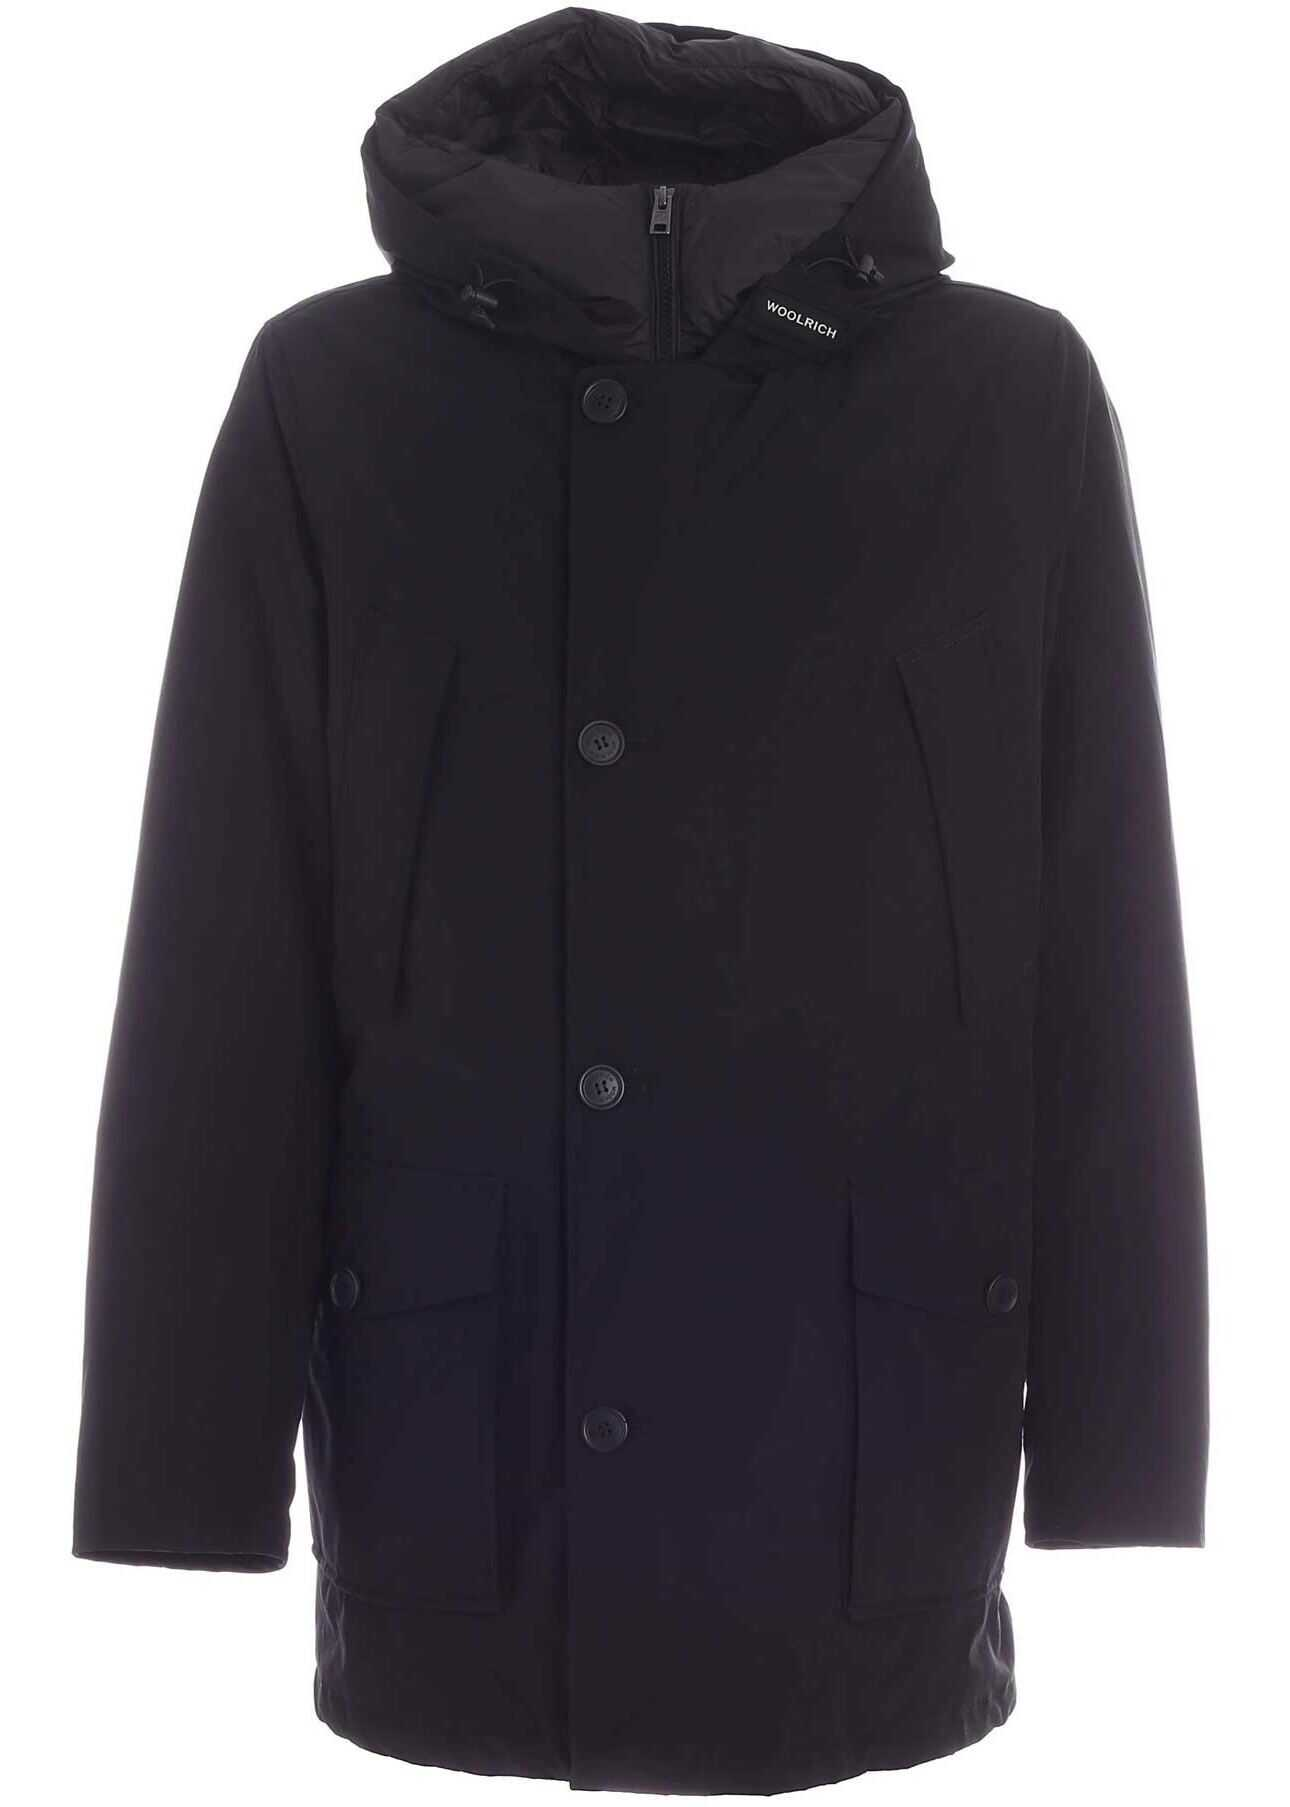 Woolrich Eco Parka Down Jacket In Black Black imagine